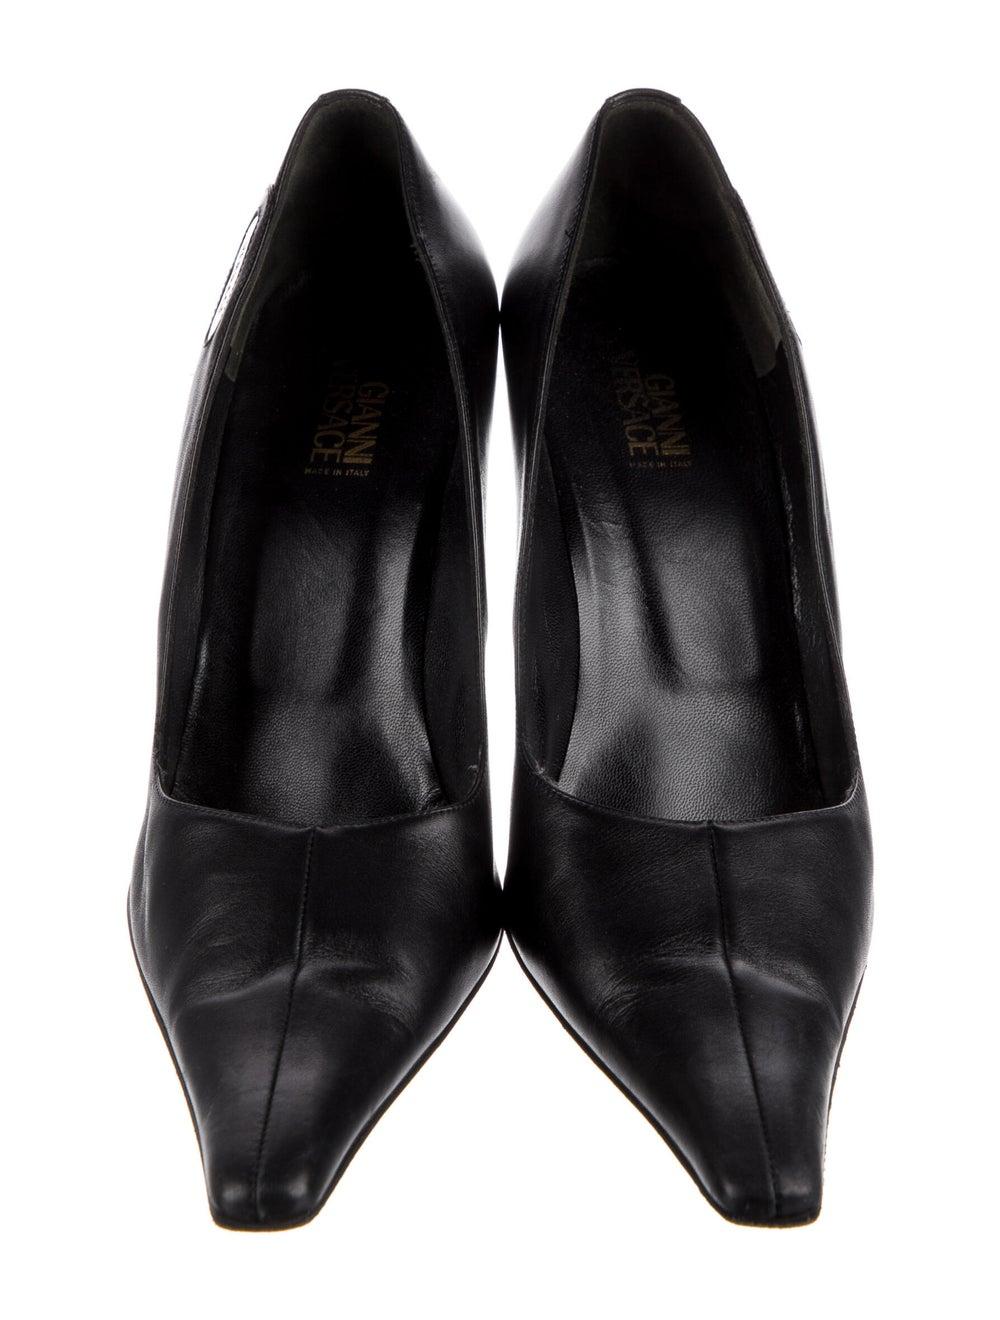 Gianni Versace Leather Pumps Black - image 3